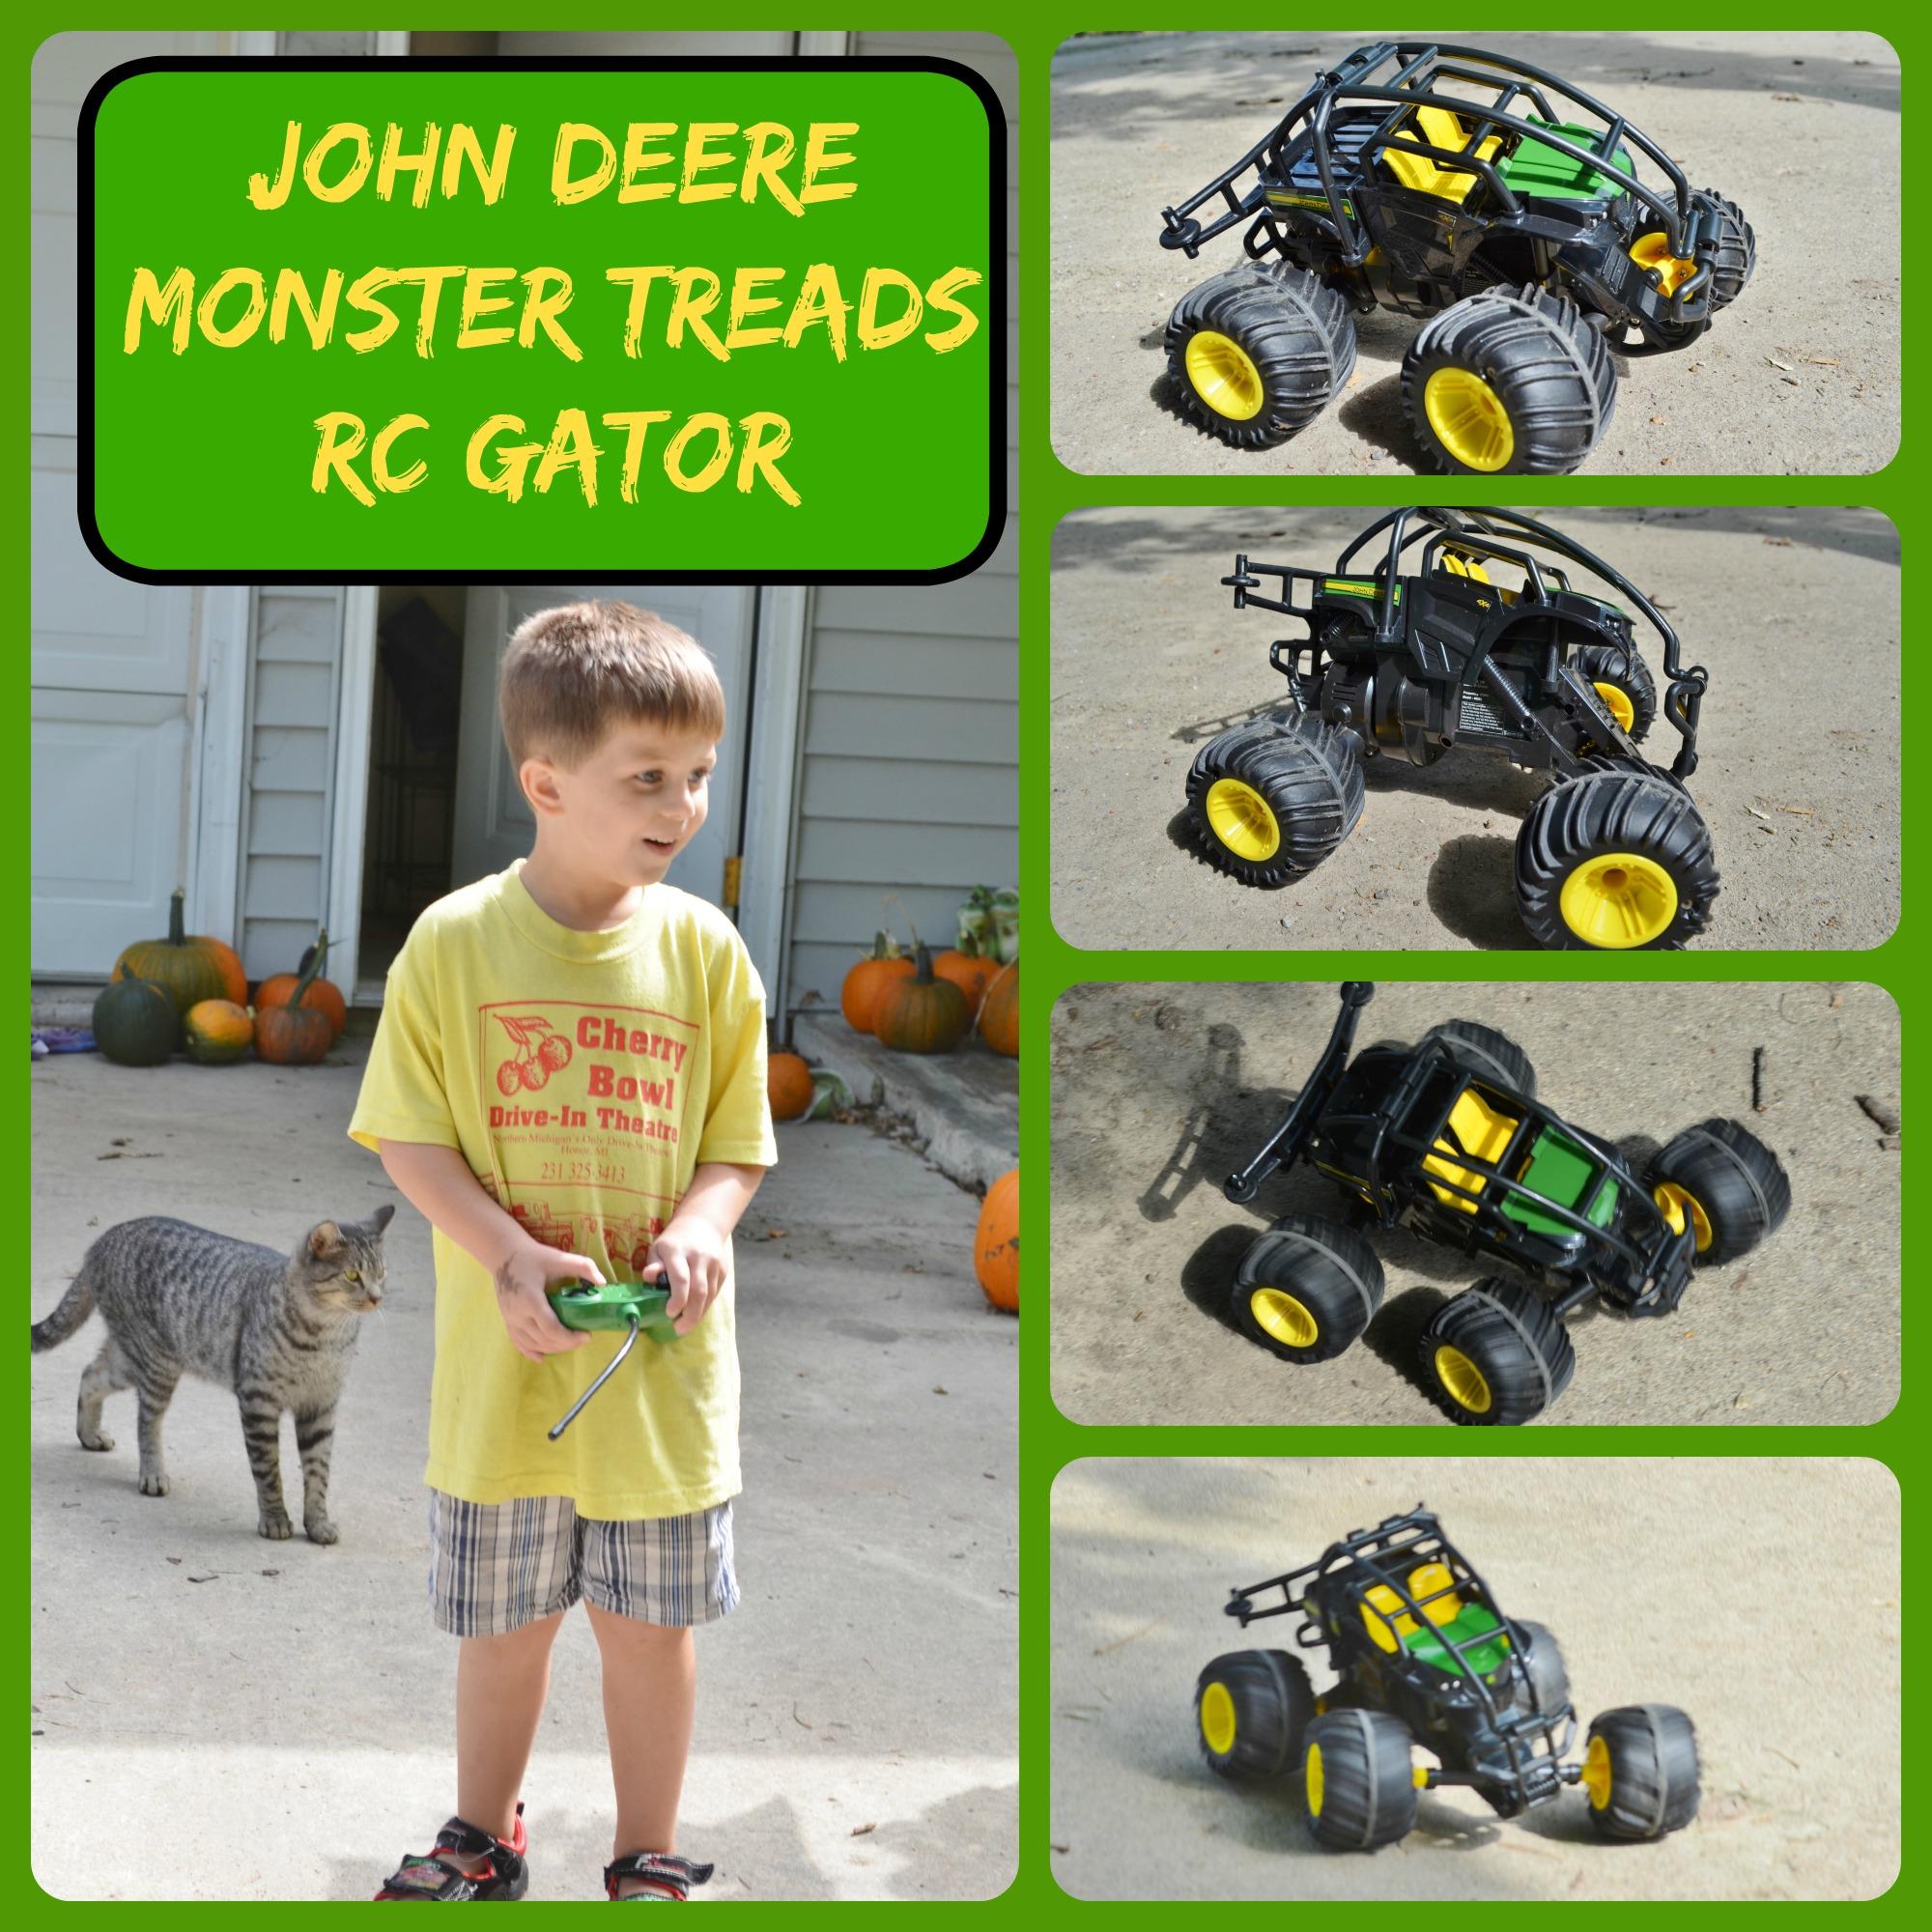 john deere monster treads rc gator toy  sc 1 st  Surviving A Teacheru0027s Salary & John Deere Monster Treads RC Gator Review